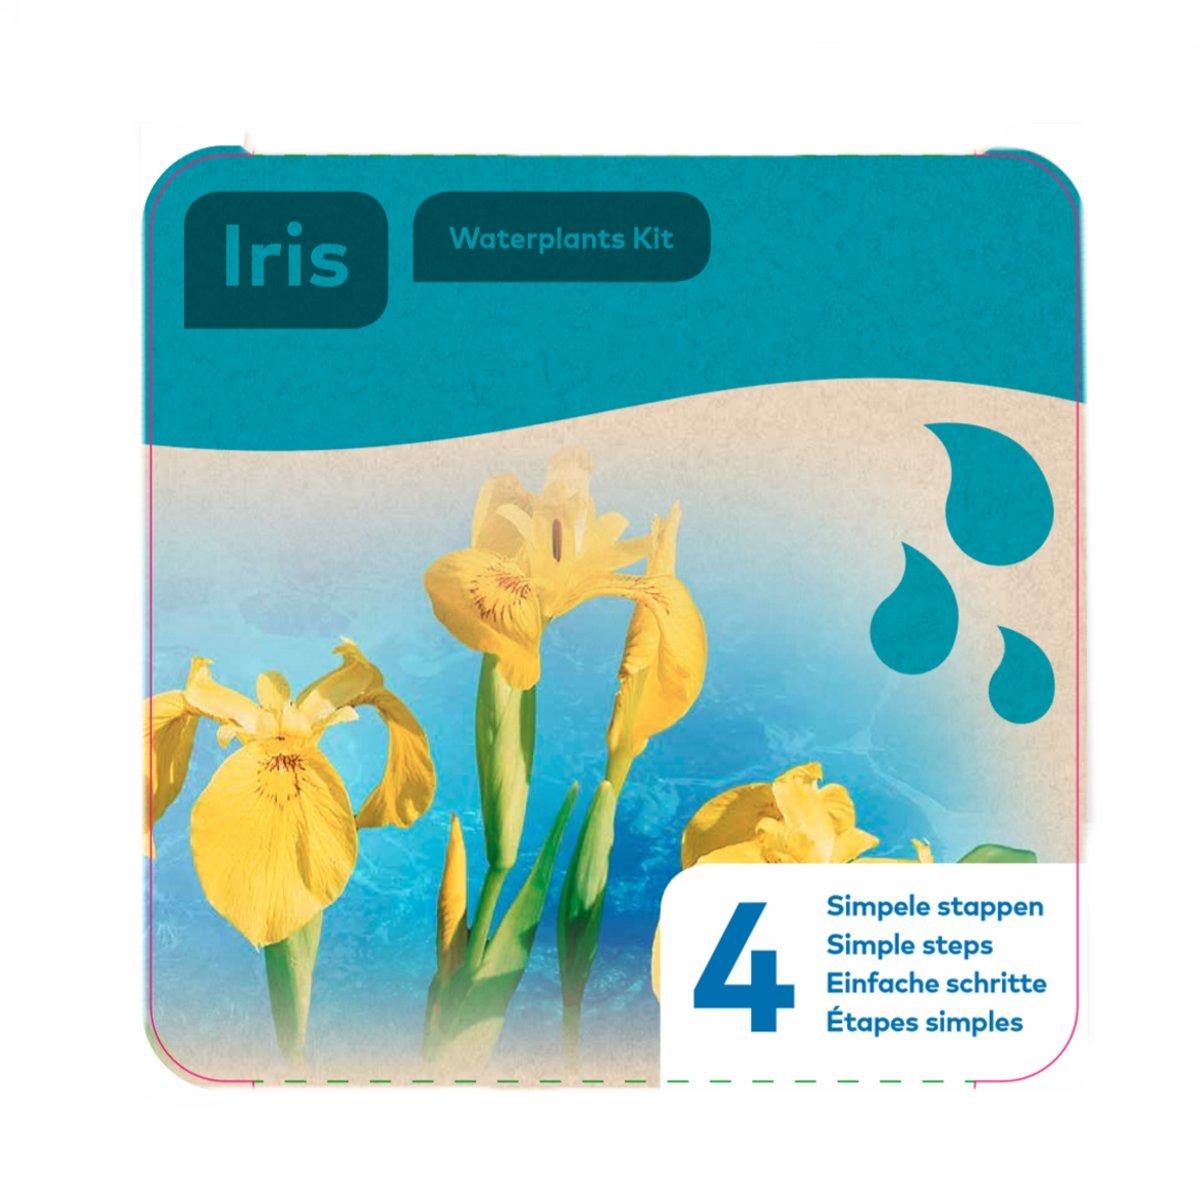 Moerings Waterplants Kit - Yellow Iris